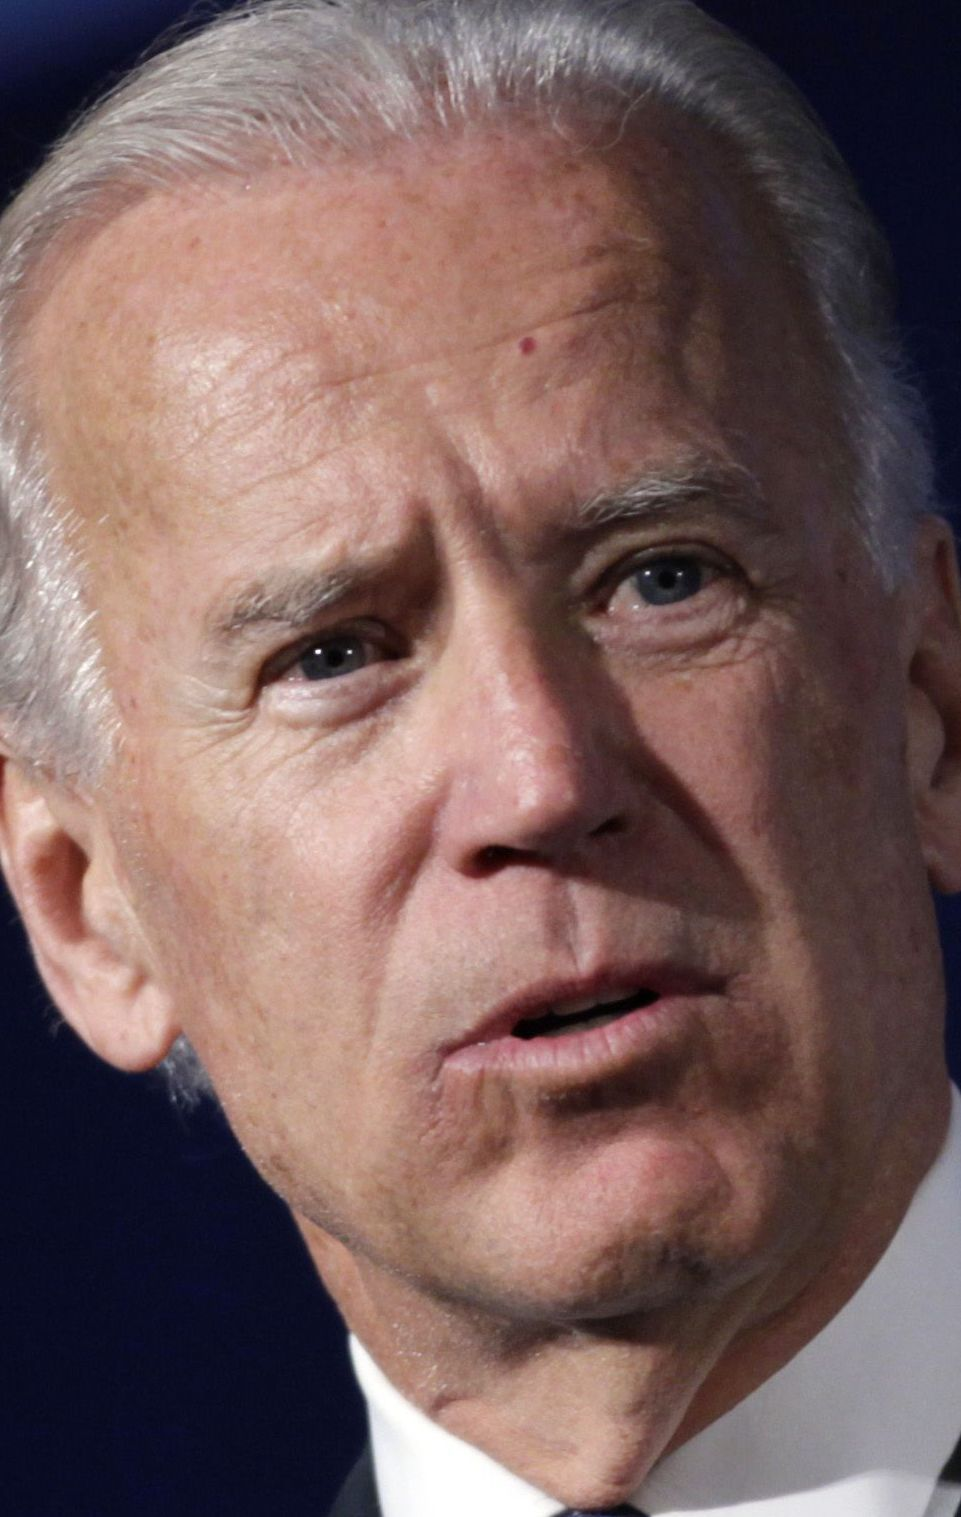 Biden returns in search of cash